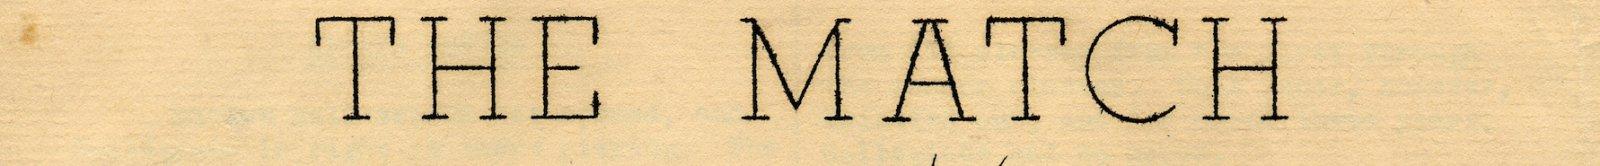 The Match Vol 1 No 1 March 1946 Masthead Detail